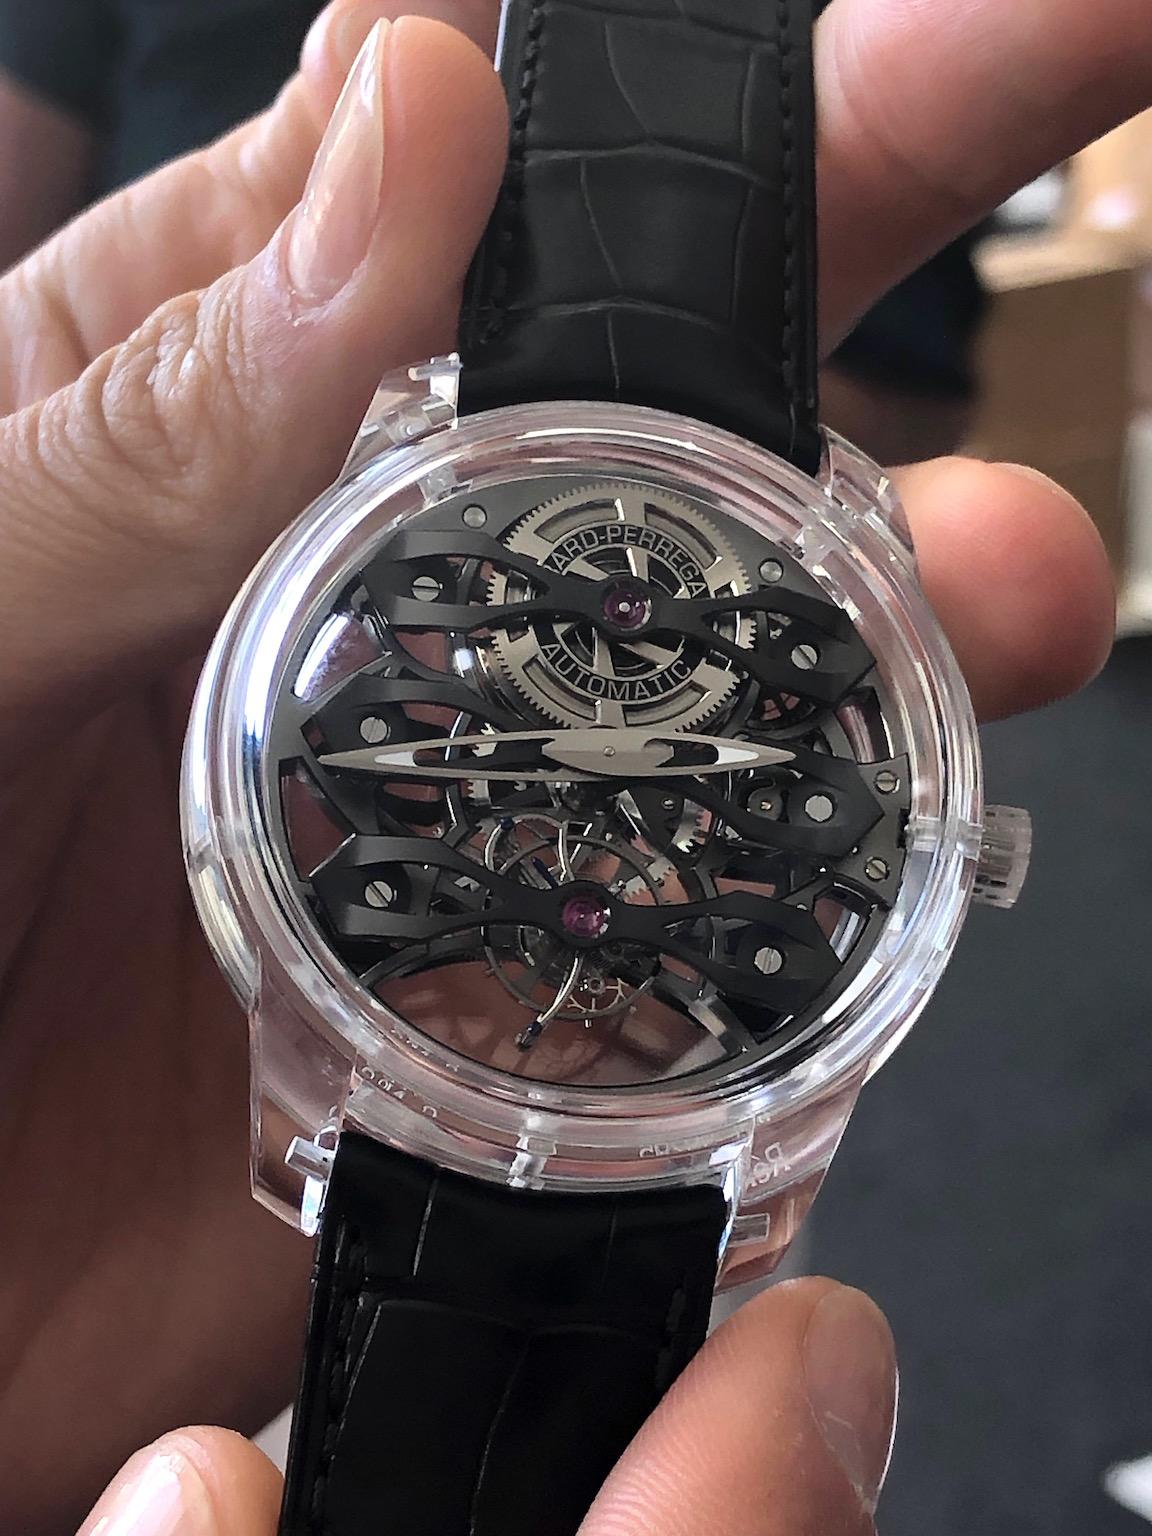 Watches & Wonders Miami 2019: Girard-Perregaux Quasar